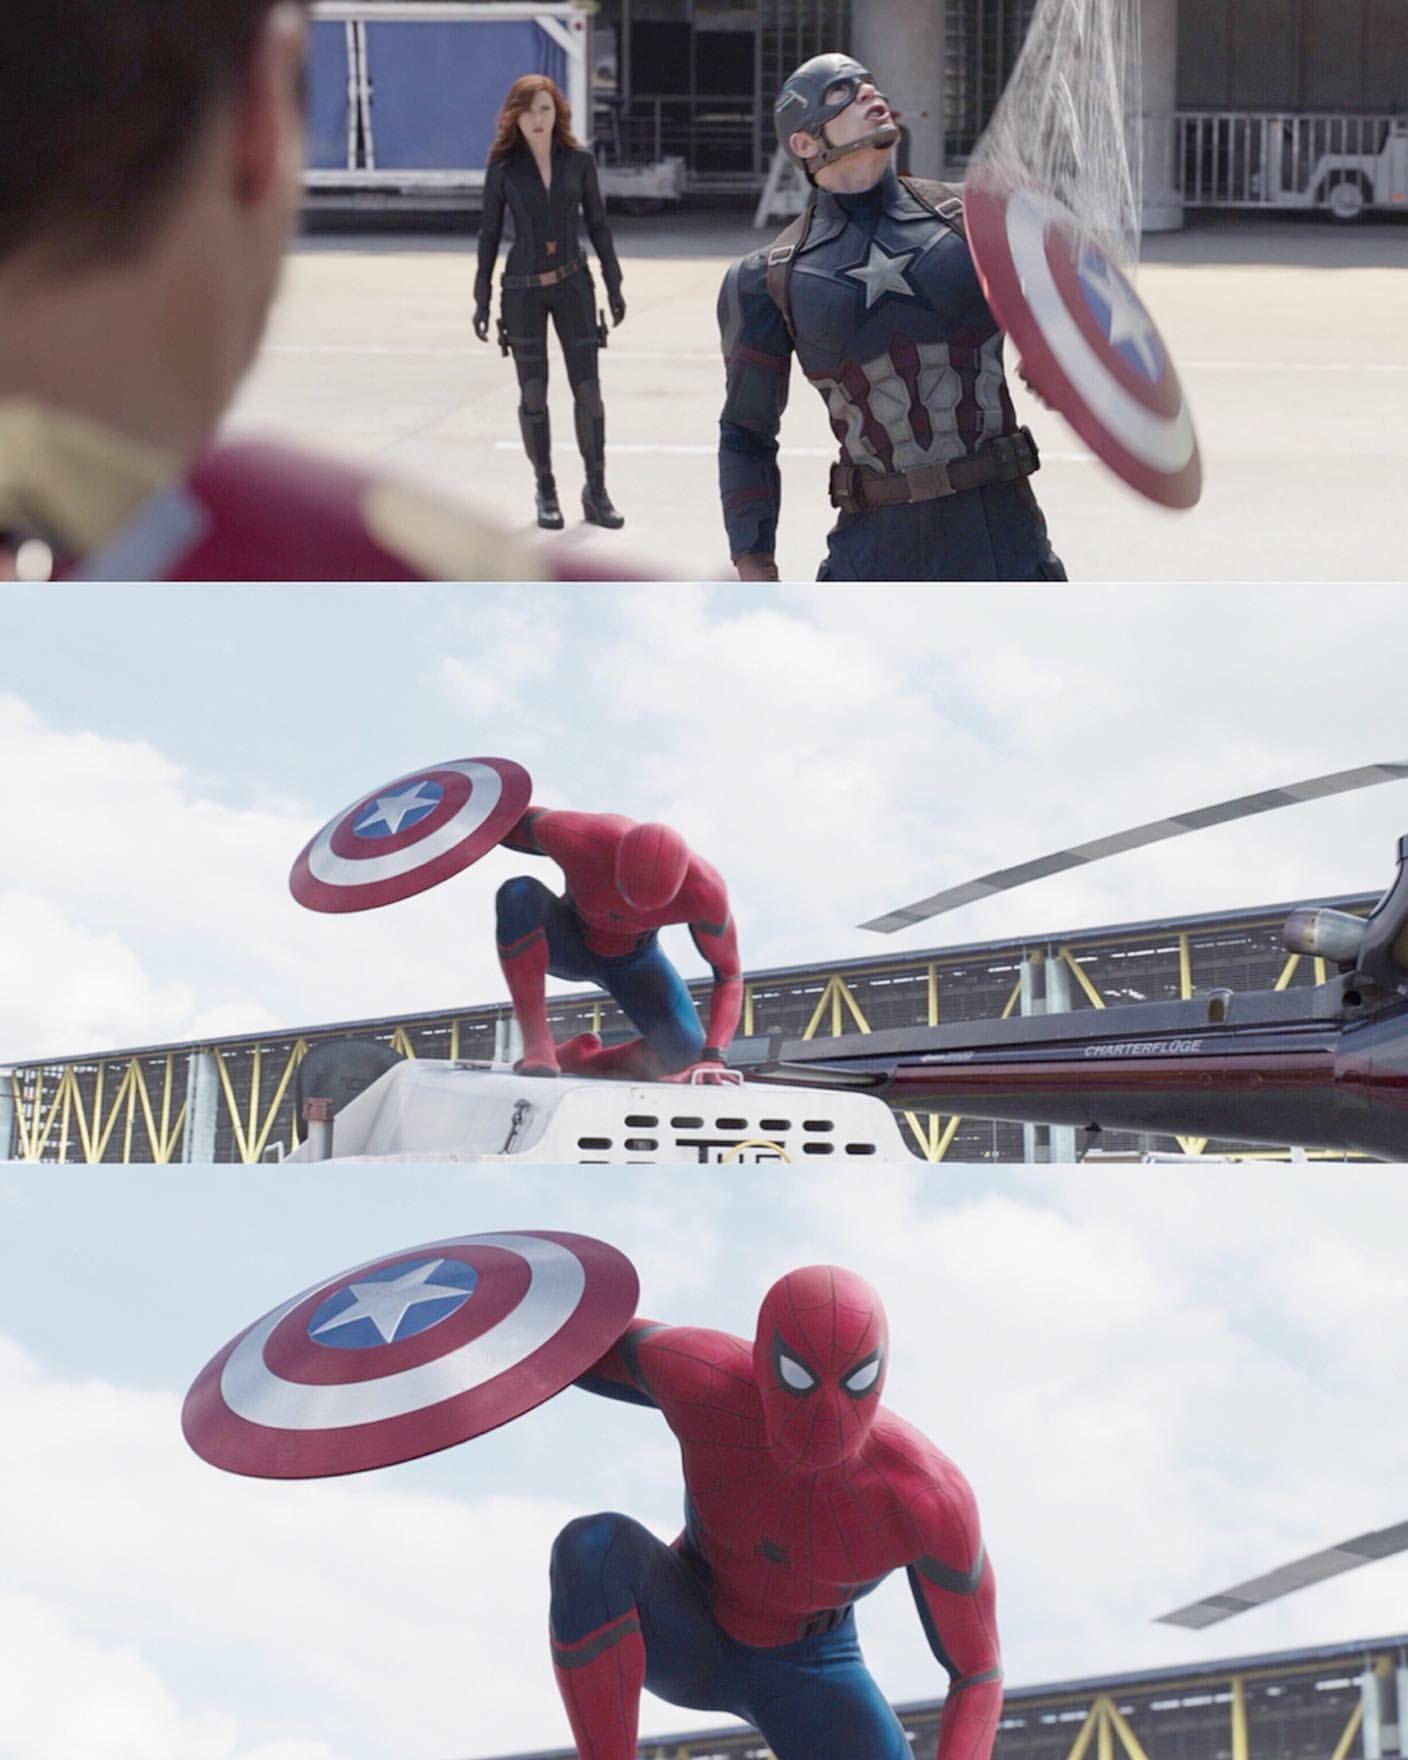 Spiderman Hey Meme : spiderman, Everyone, Still, Remember, Crazy, Spider-Man, Appeared, Civil…, Captain, America, Civil, Meme,, America,, Funny, Marvel, Memes